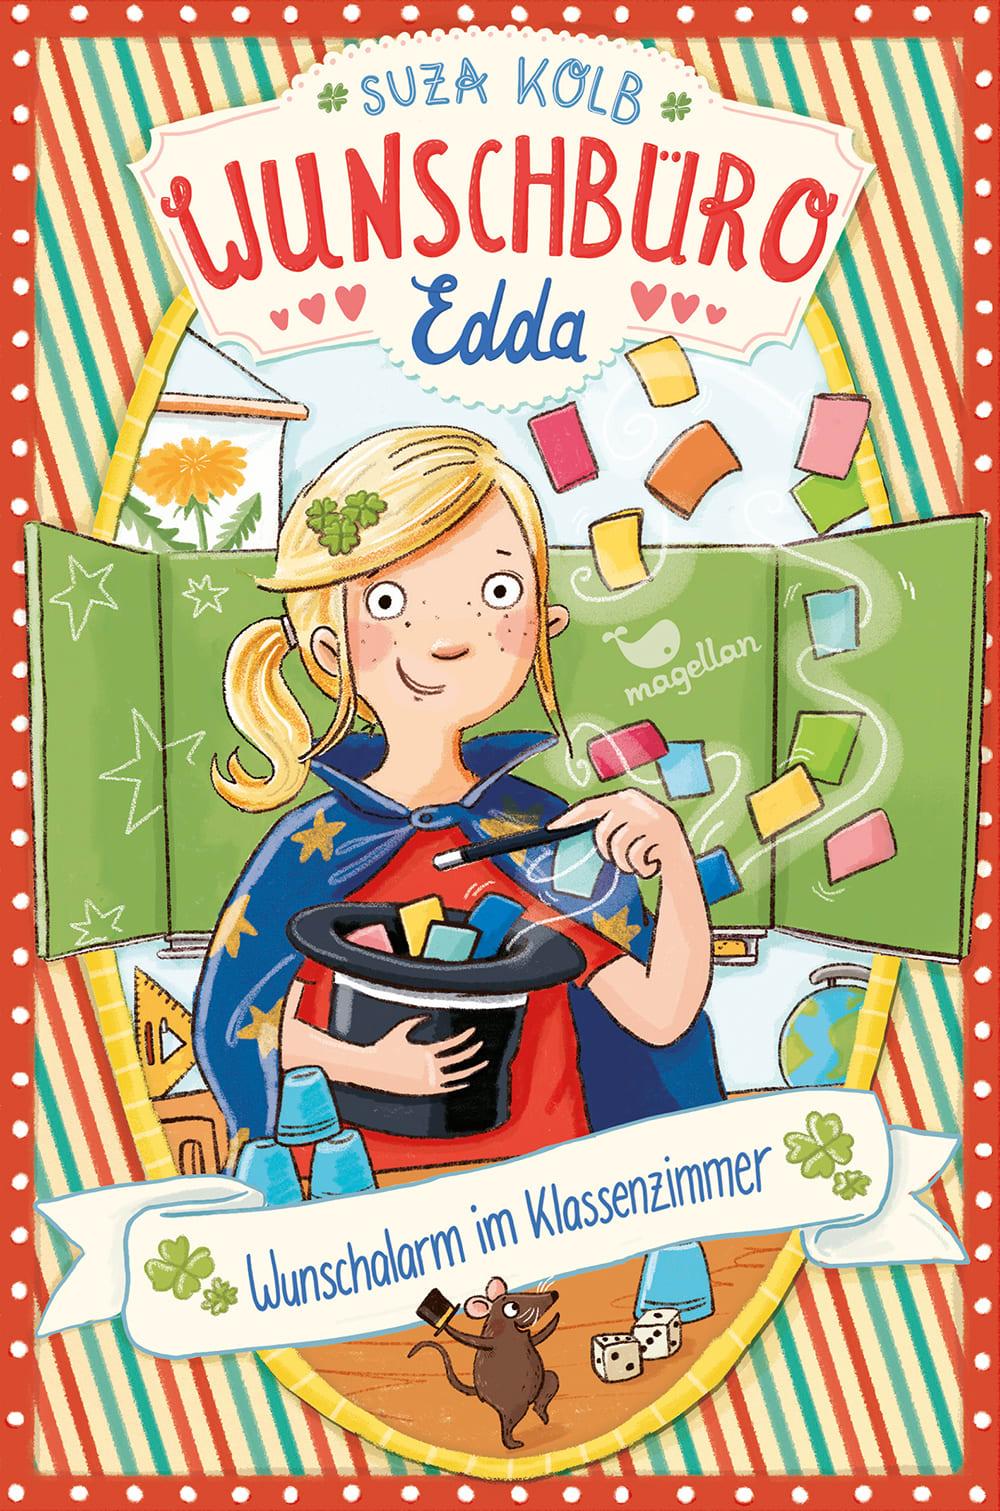 Cover Wunschbüro Edda Band4 Wunschalarm im Klassenzimmer Kinderbuch von Suza Kolb